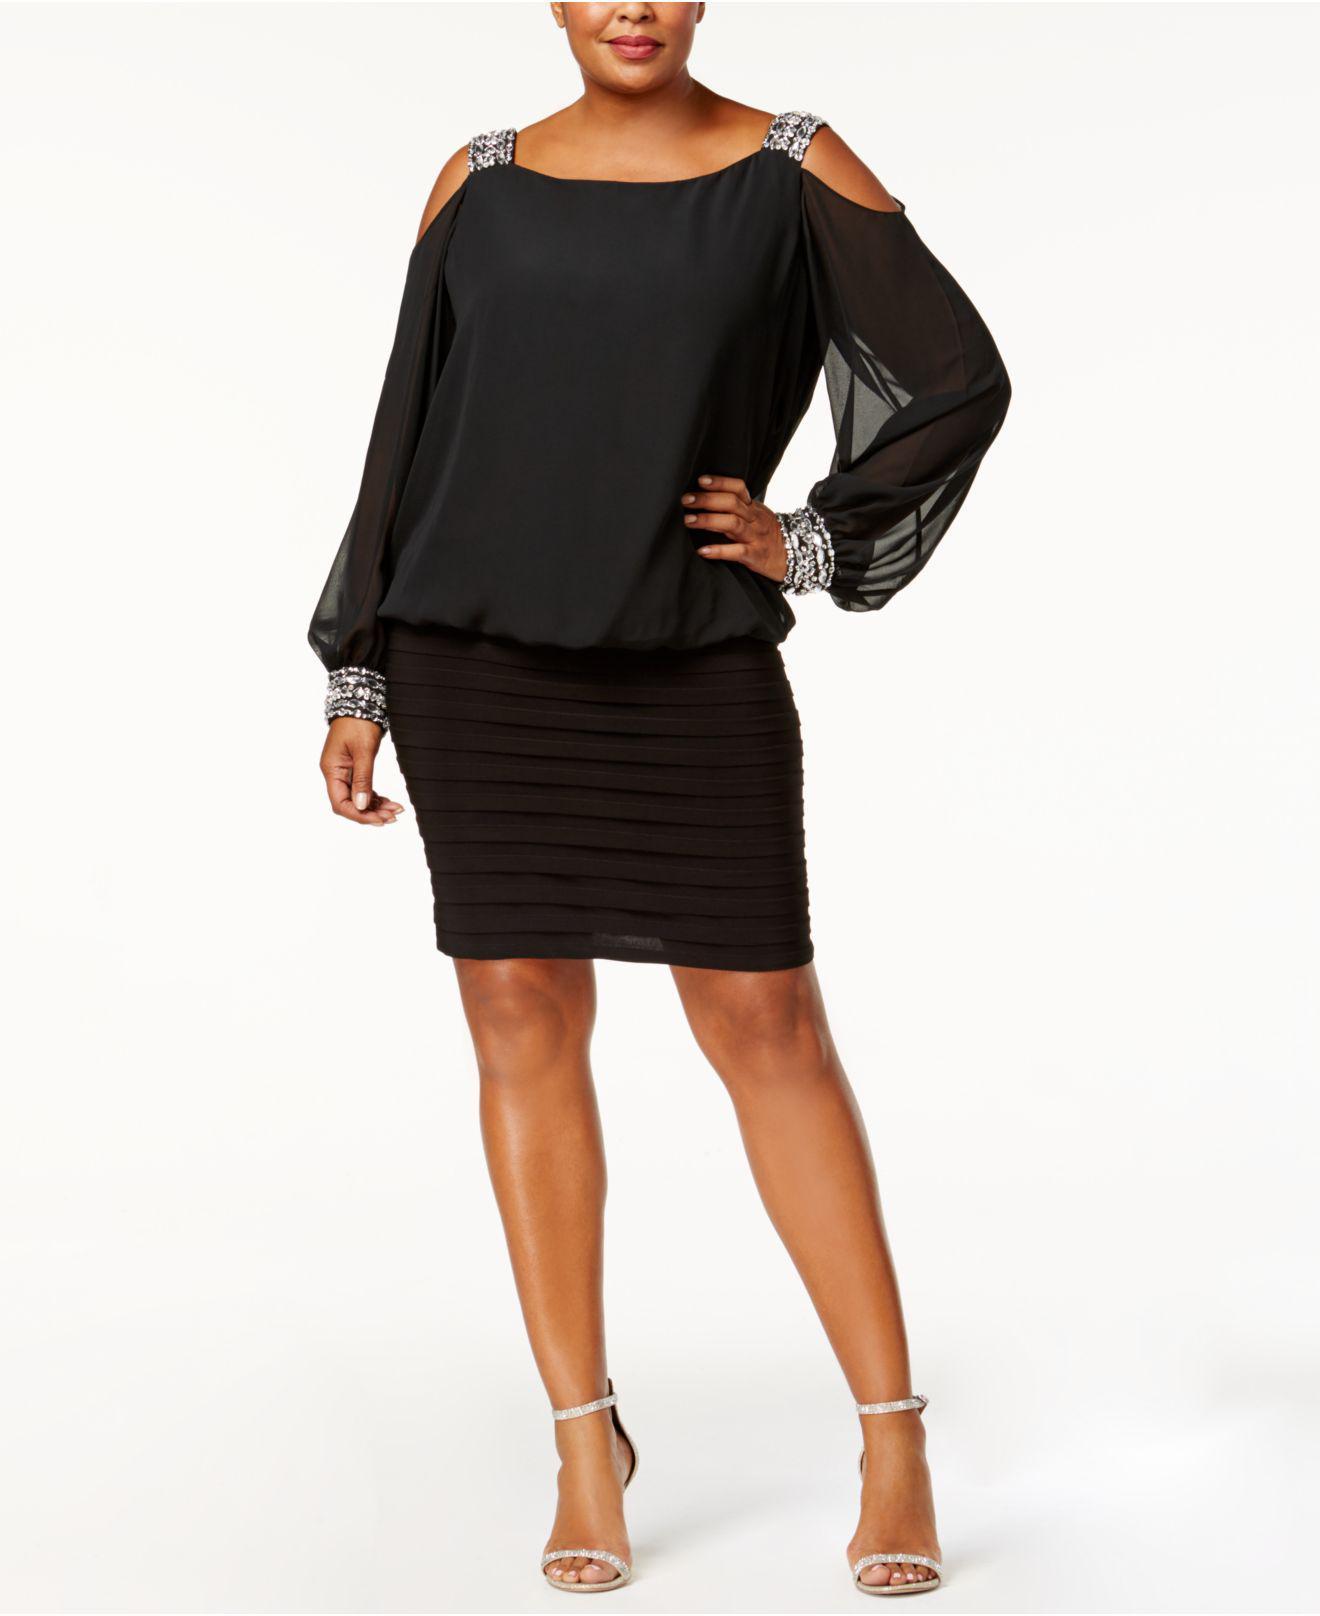 febd9e1a2fd Betsy   Adam. Women s Black Plus Size Cold-shoulder Embellished Blouson  Dress